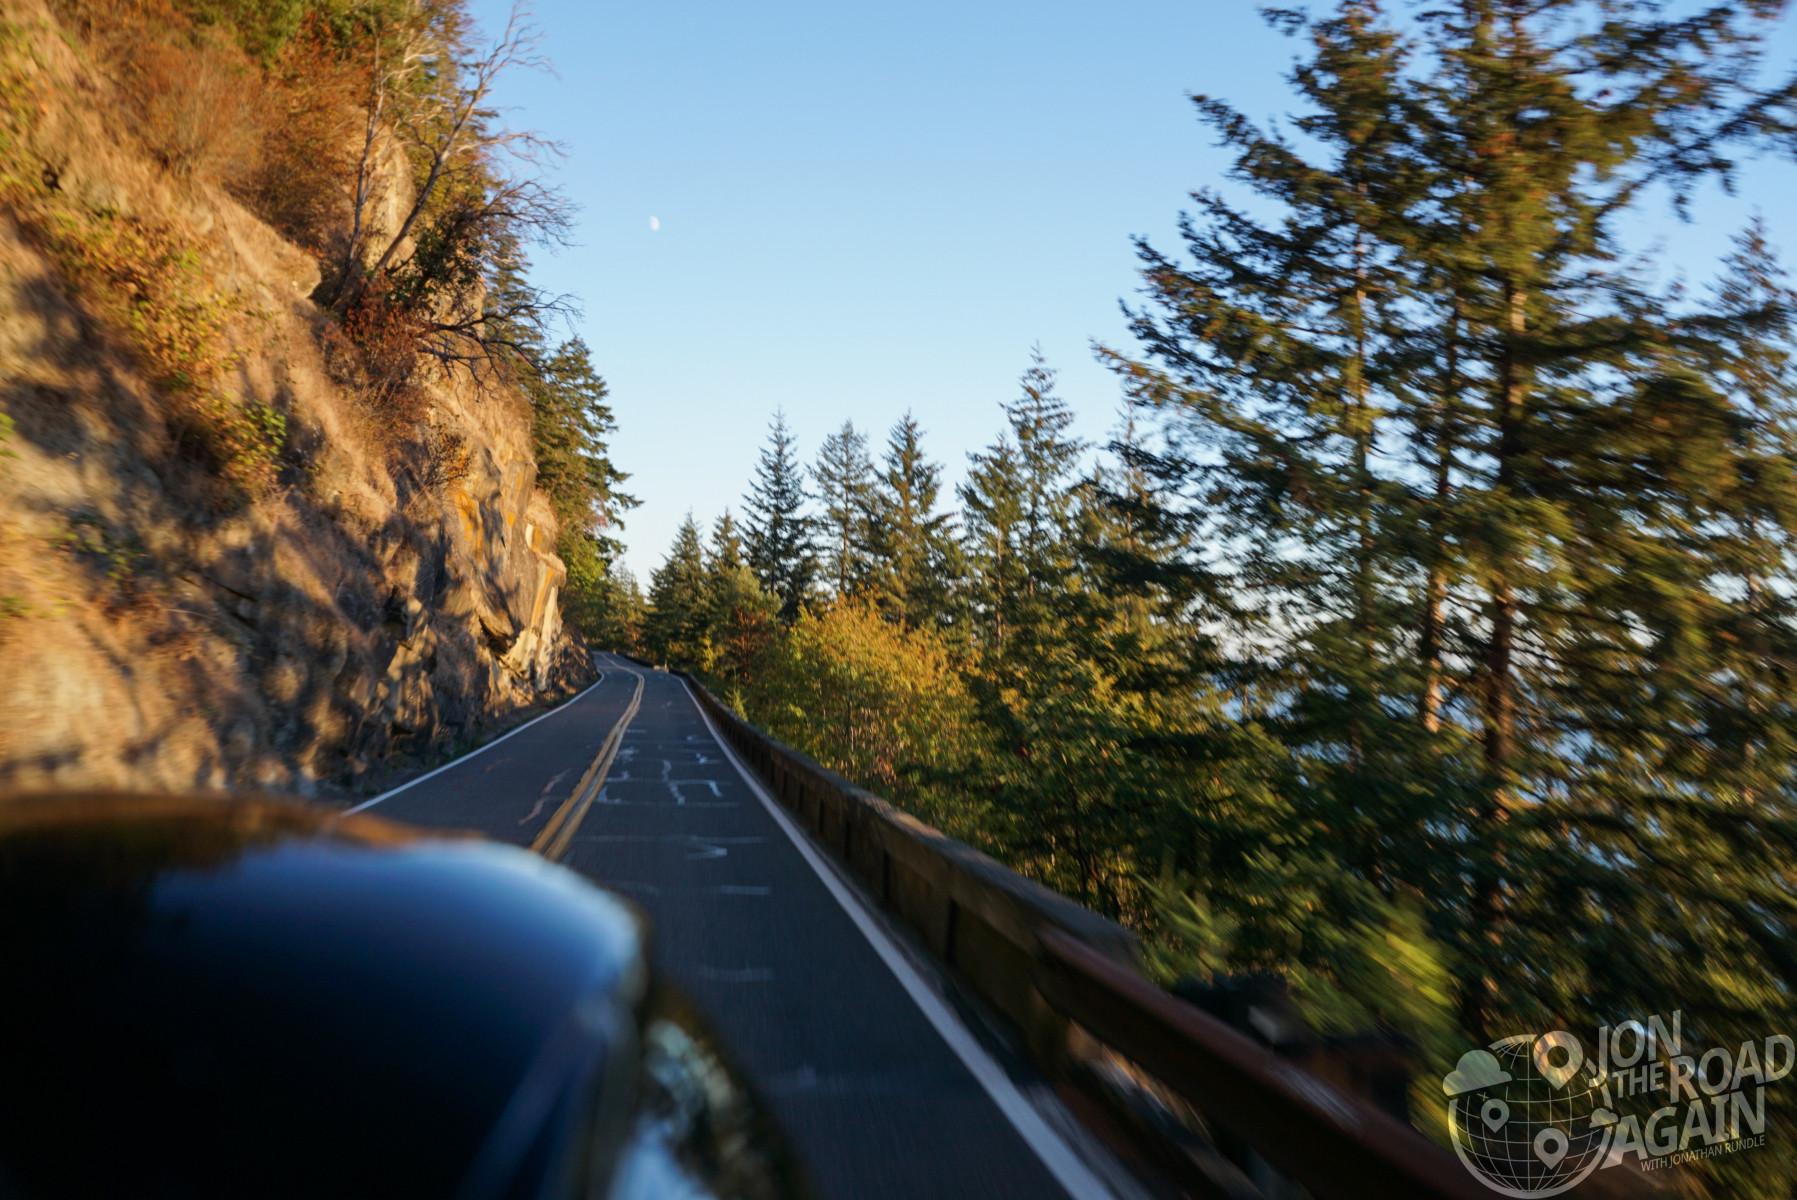 Riding Chuckanut Drive